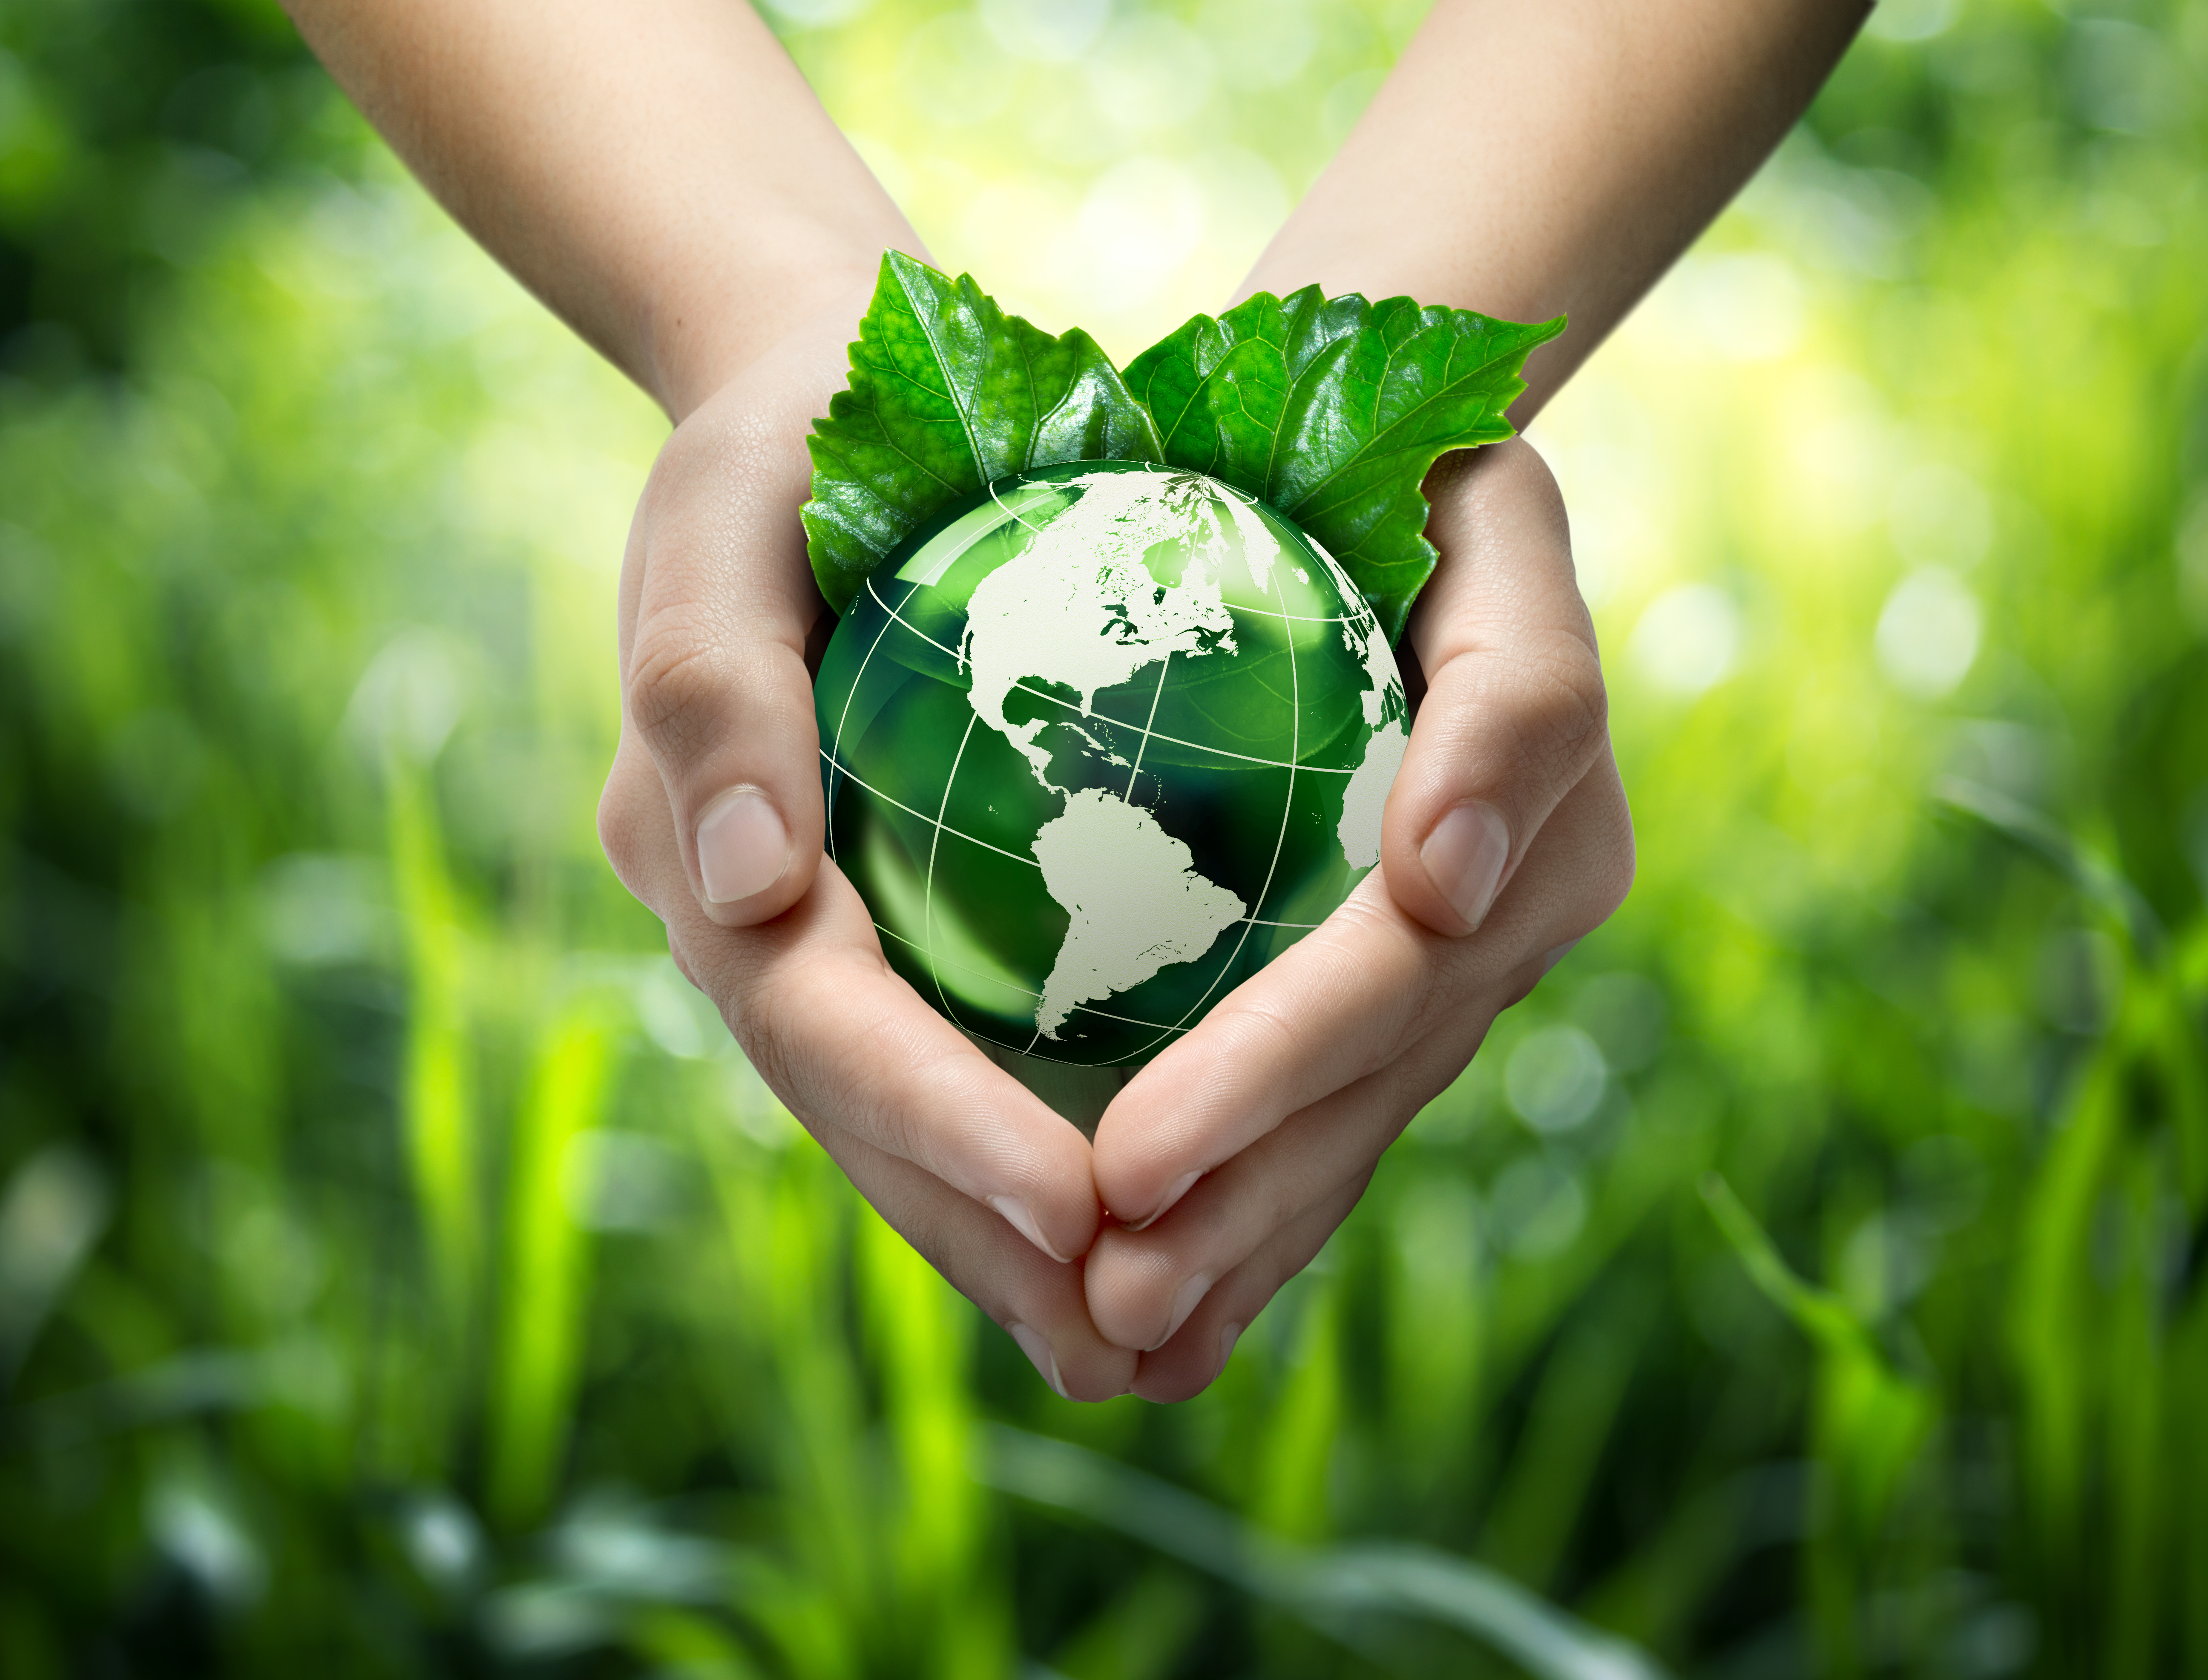 morecambe metals recycles metal in eco-friendly way